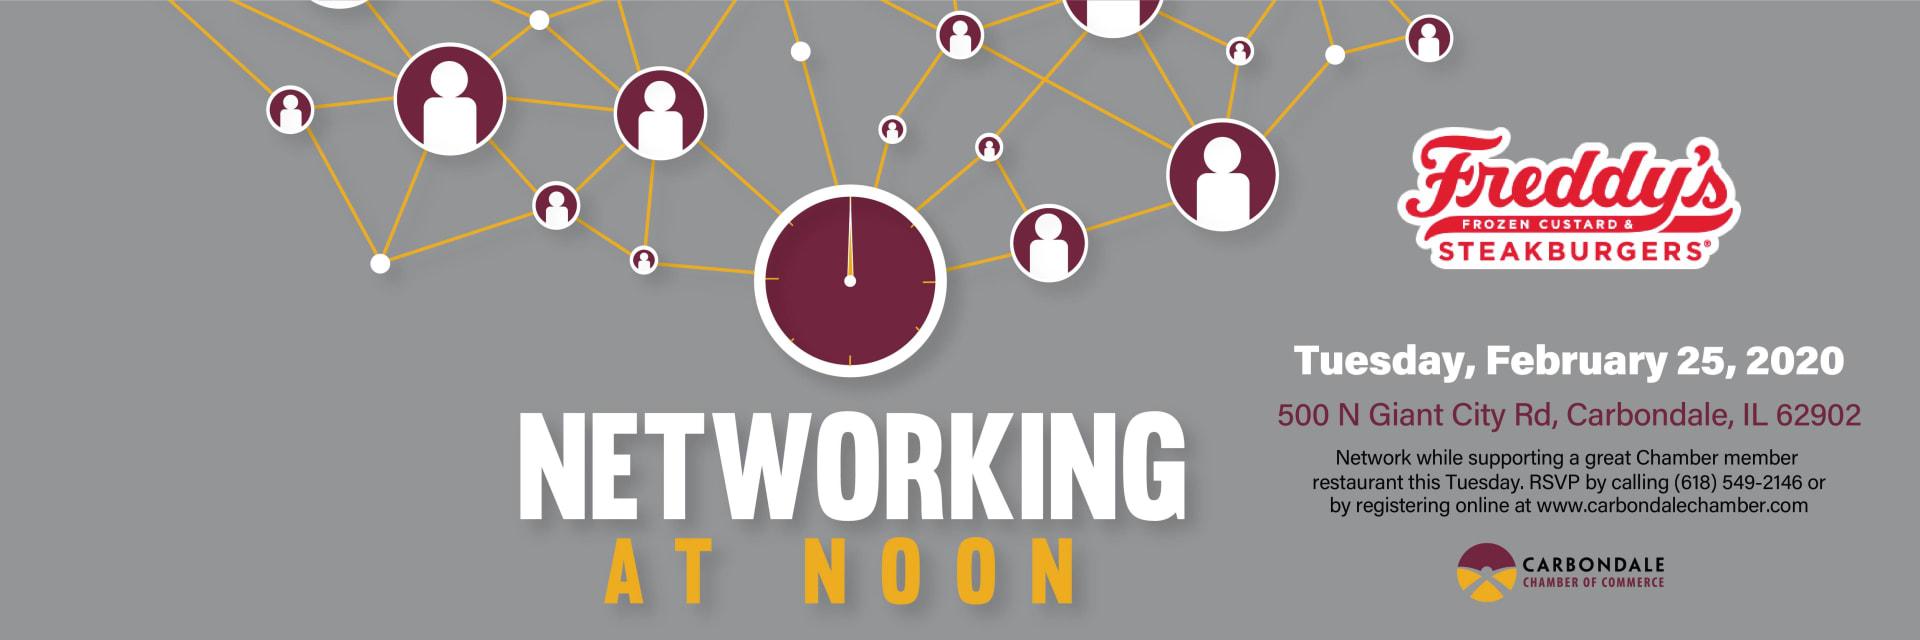 Feb-Networking-at-Noon_Slider-01-w1920.jpg